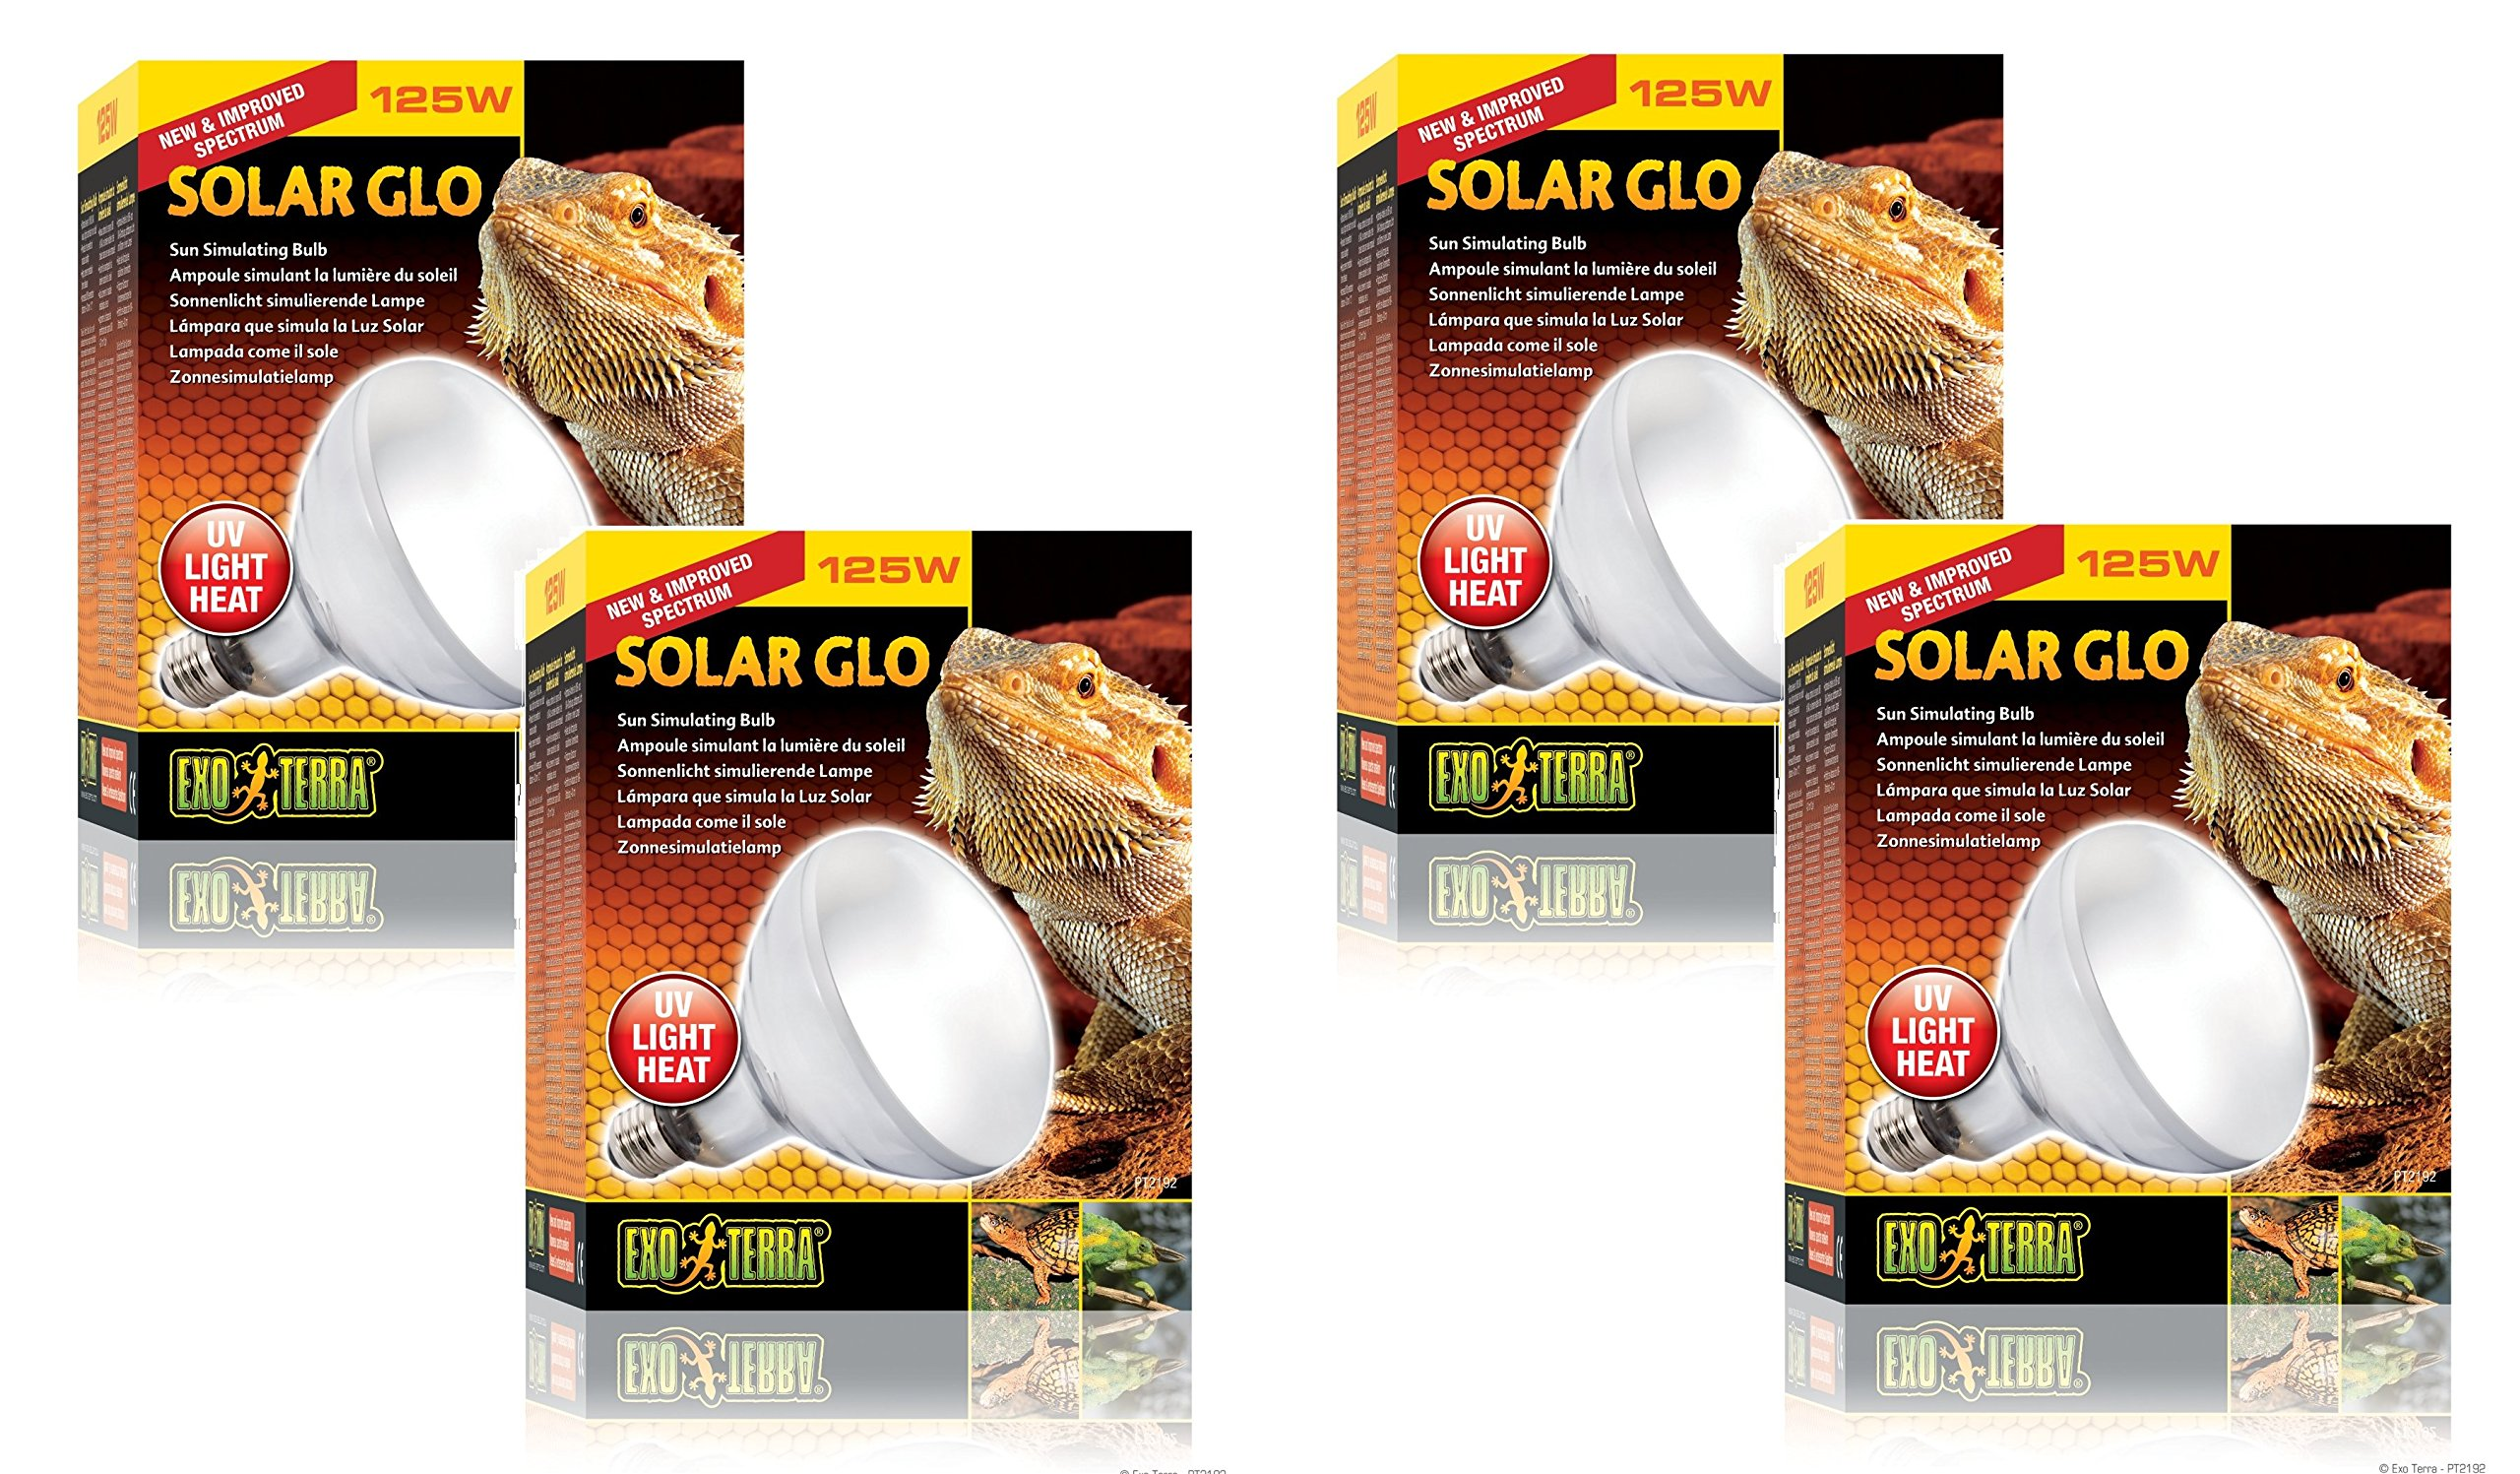 (4 Pack) Exo Terra Solar-Glo High Intensity Self-Ballasted Uv/Heat Mercury Vapor Lamp, 125 Watt by Exo Terra